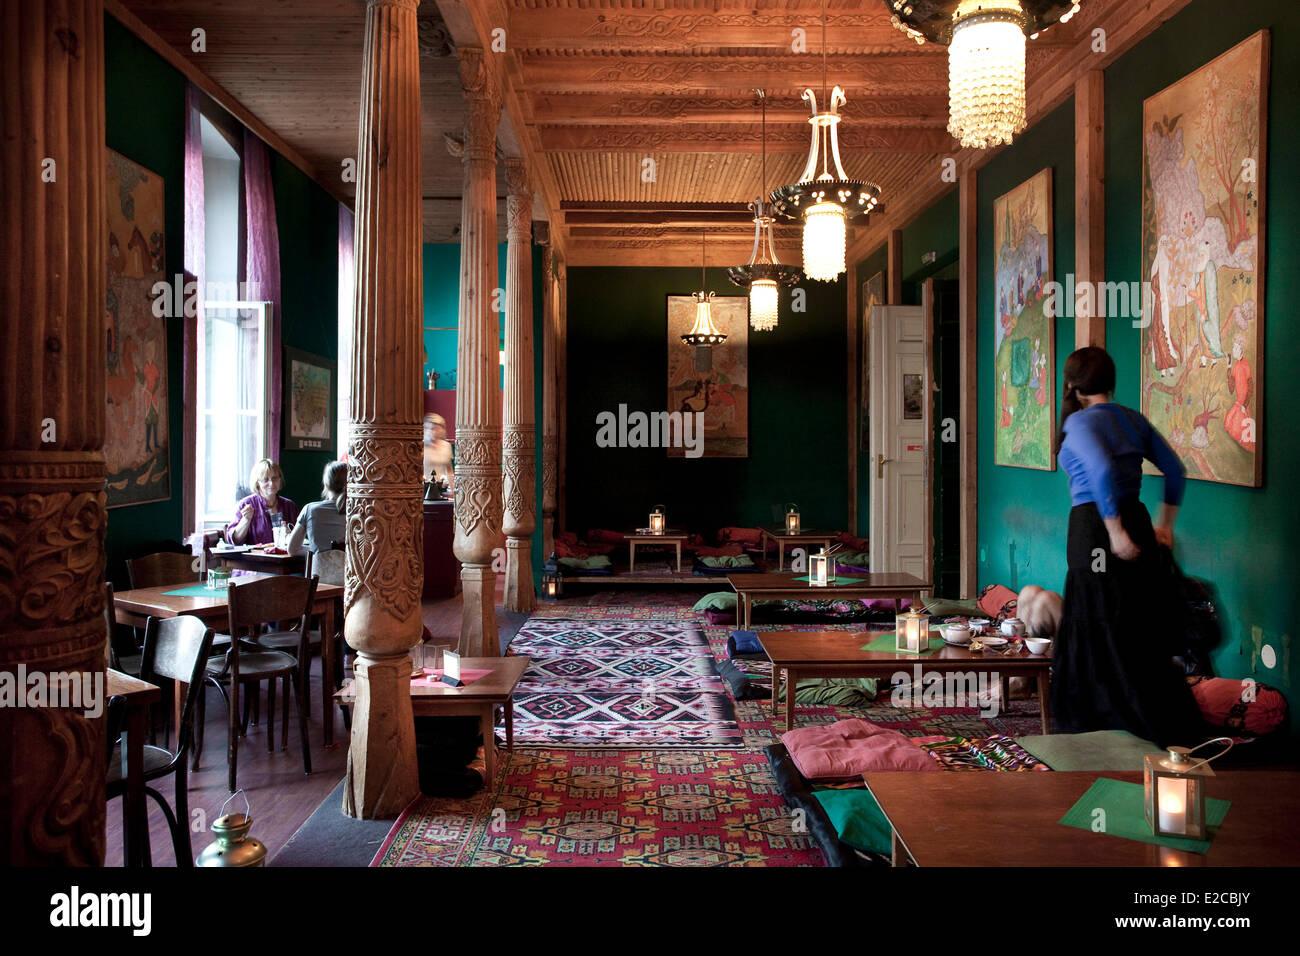 Germany, Berlin, Mitte, Tajikistan Tea Room - Stock Image